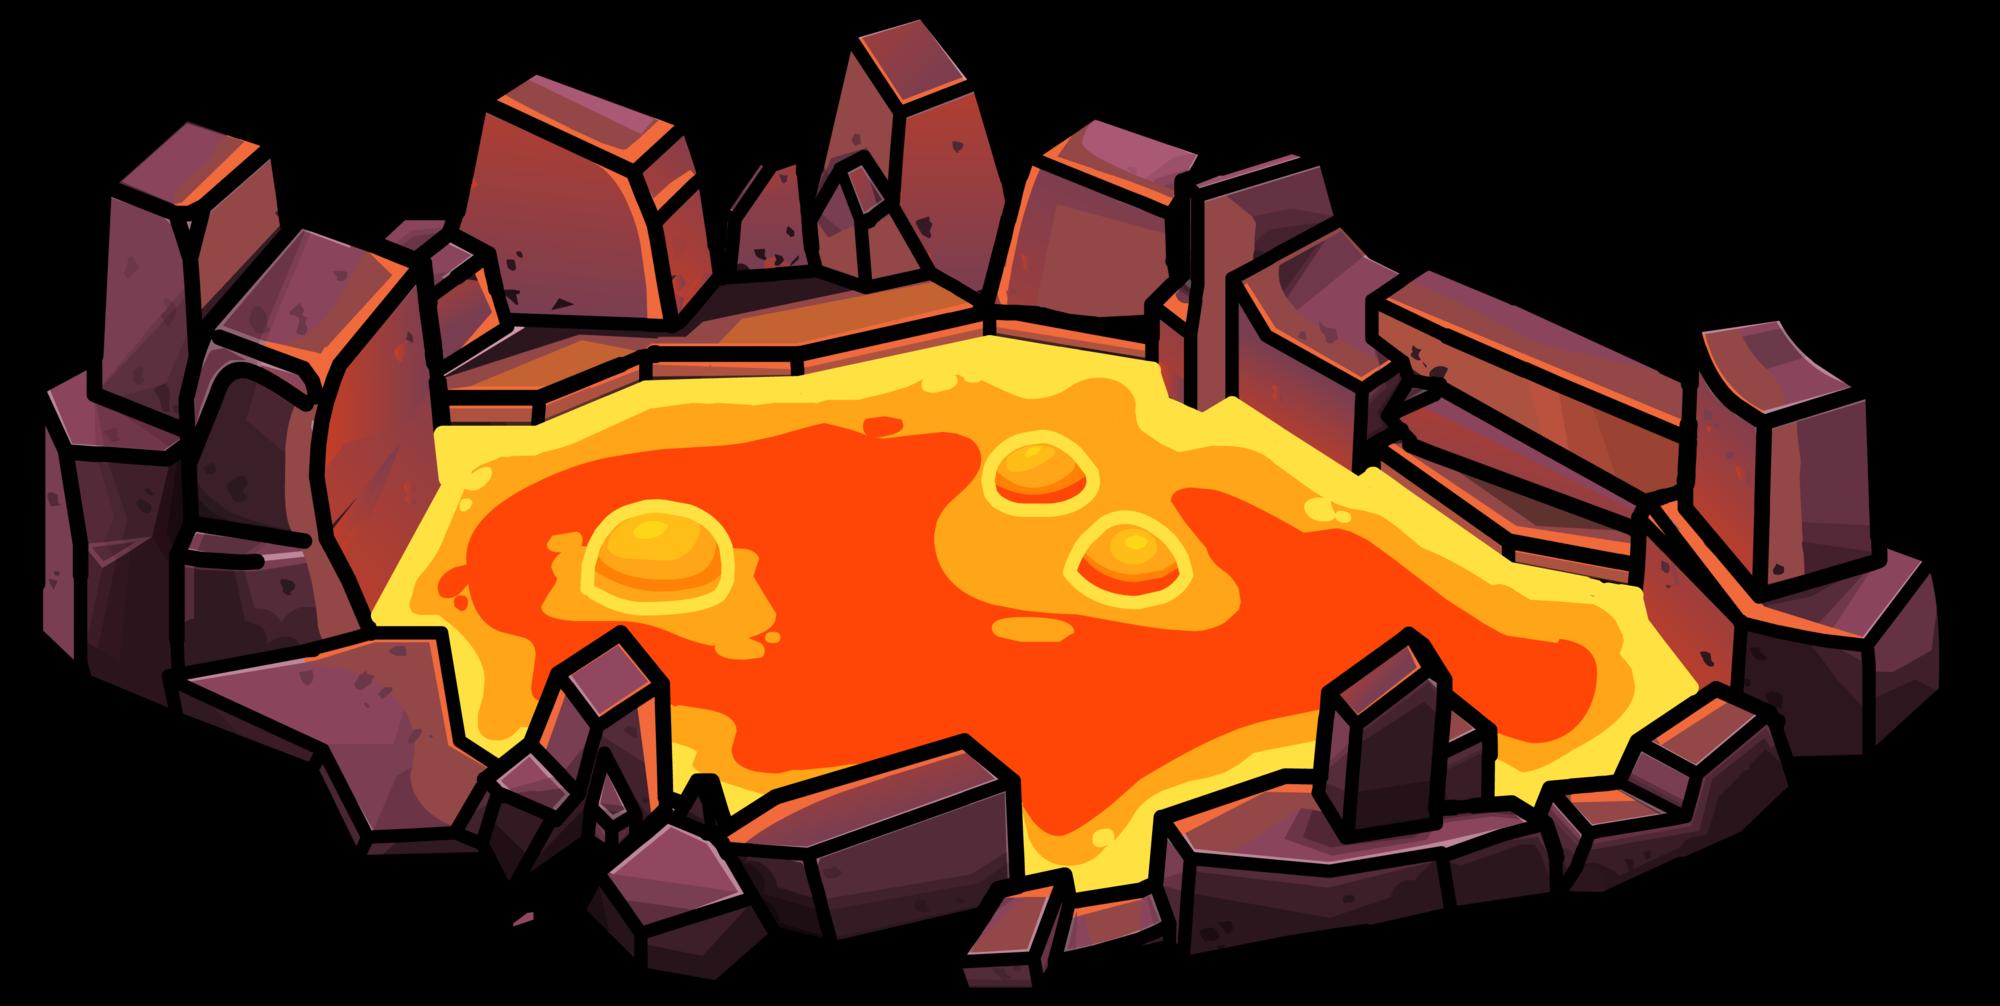 Clipart rock lava rock. Pool club penguin wiki